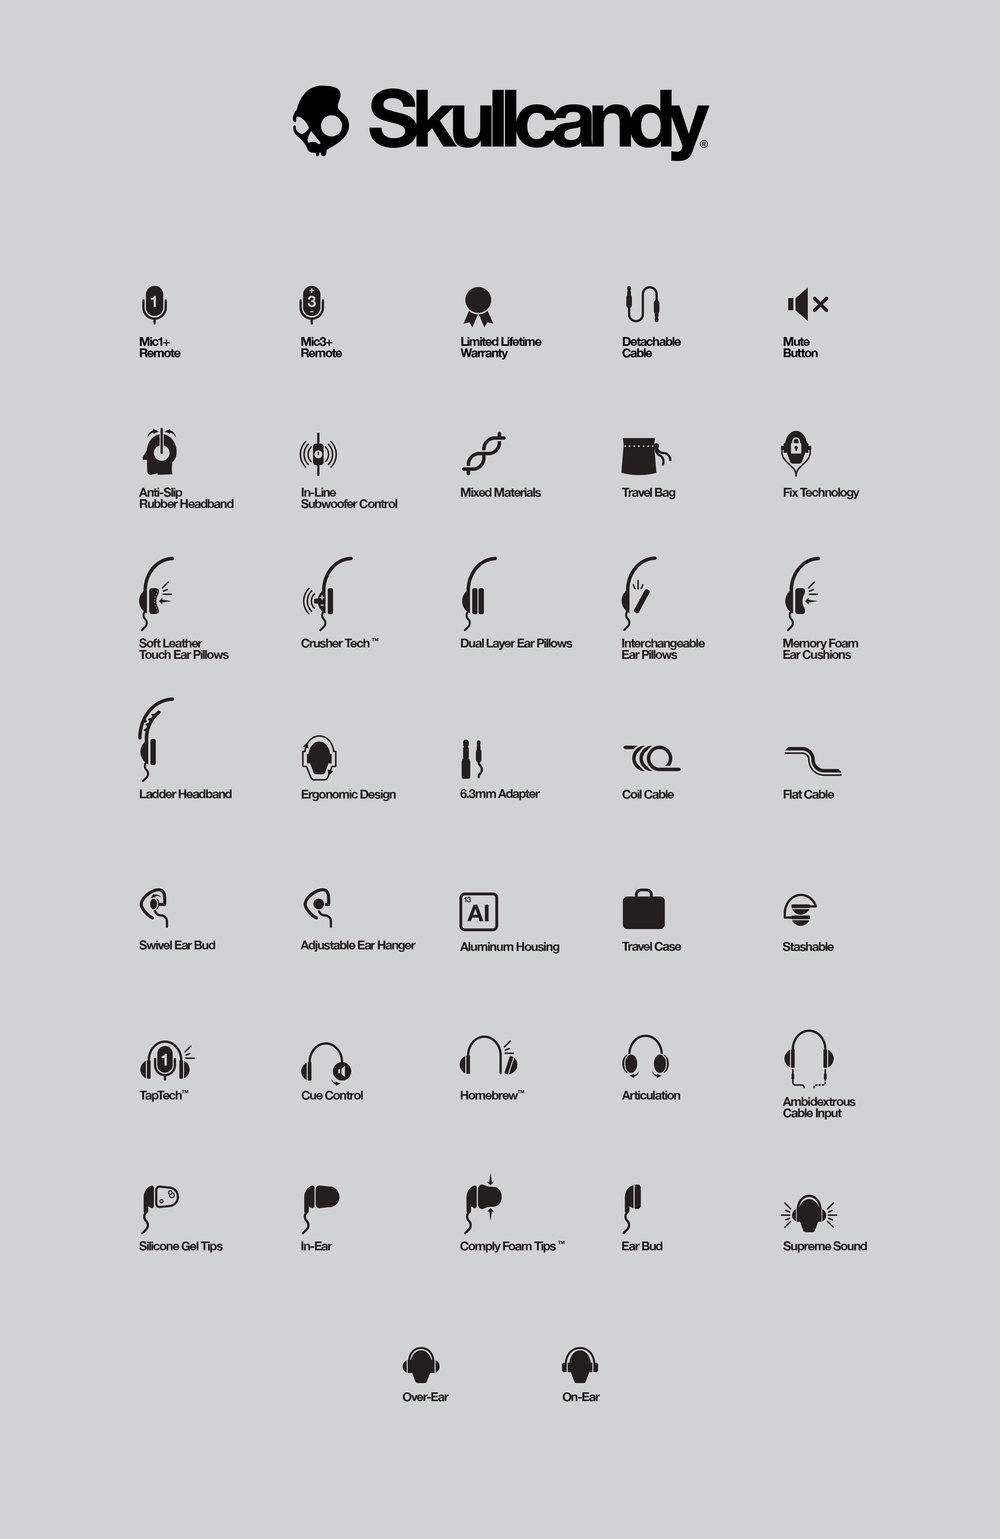 skullcandy.icons.image.1.jpg